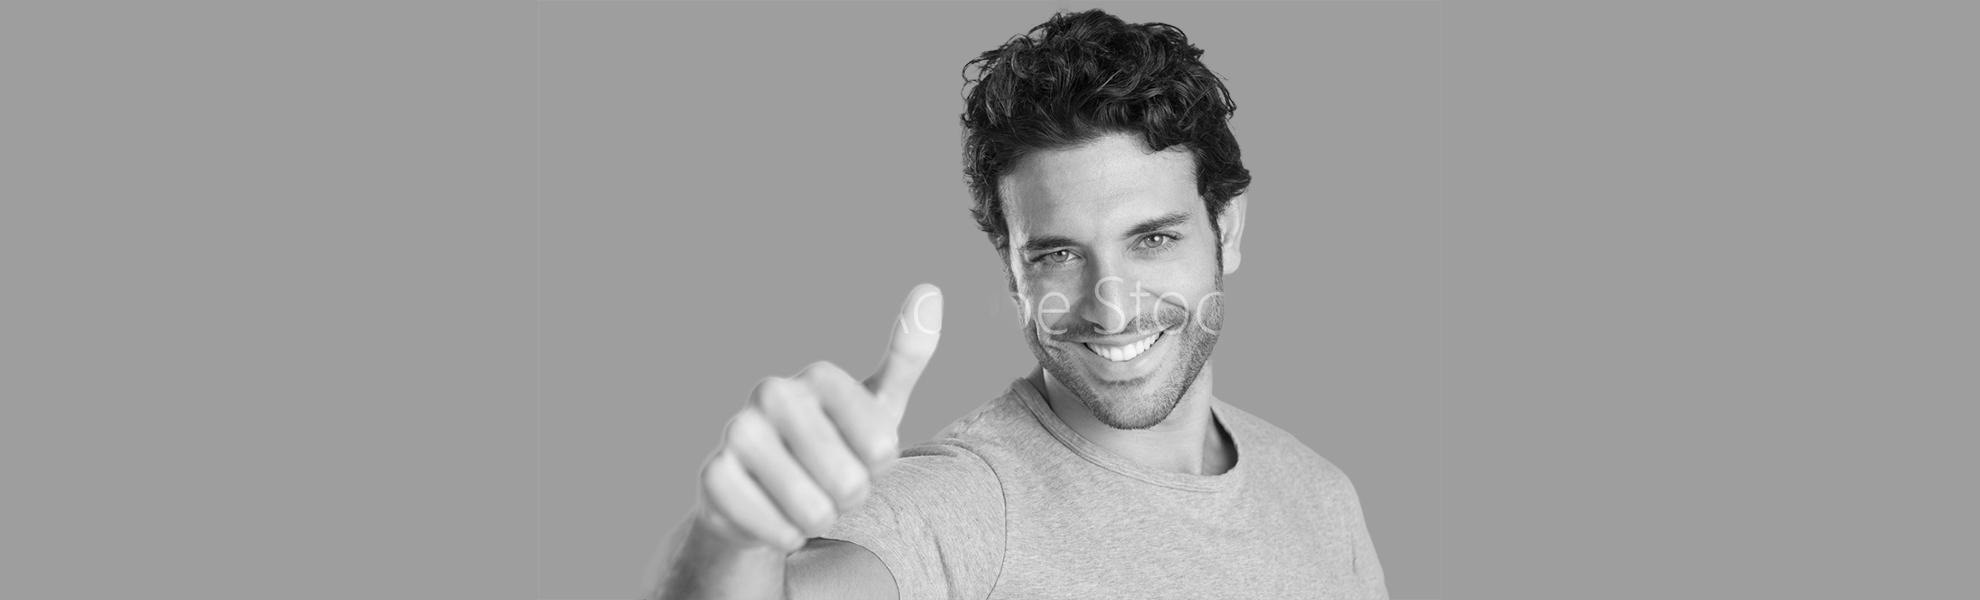 ¿Merece la pena la ortodoncia removible en adultos? ¿O mejor uso la fija?